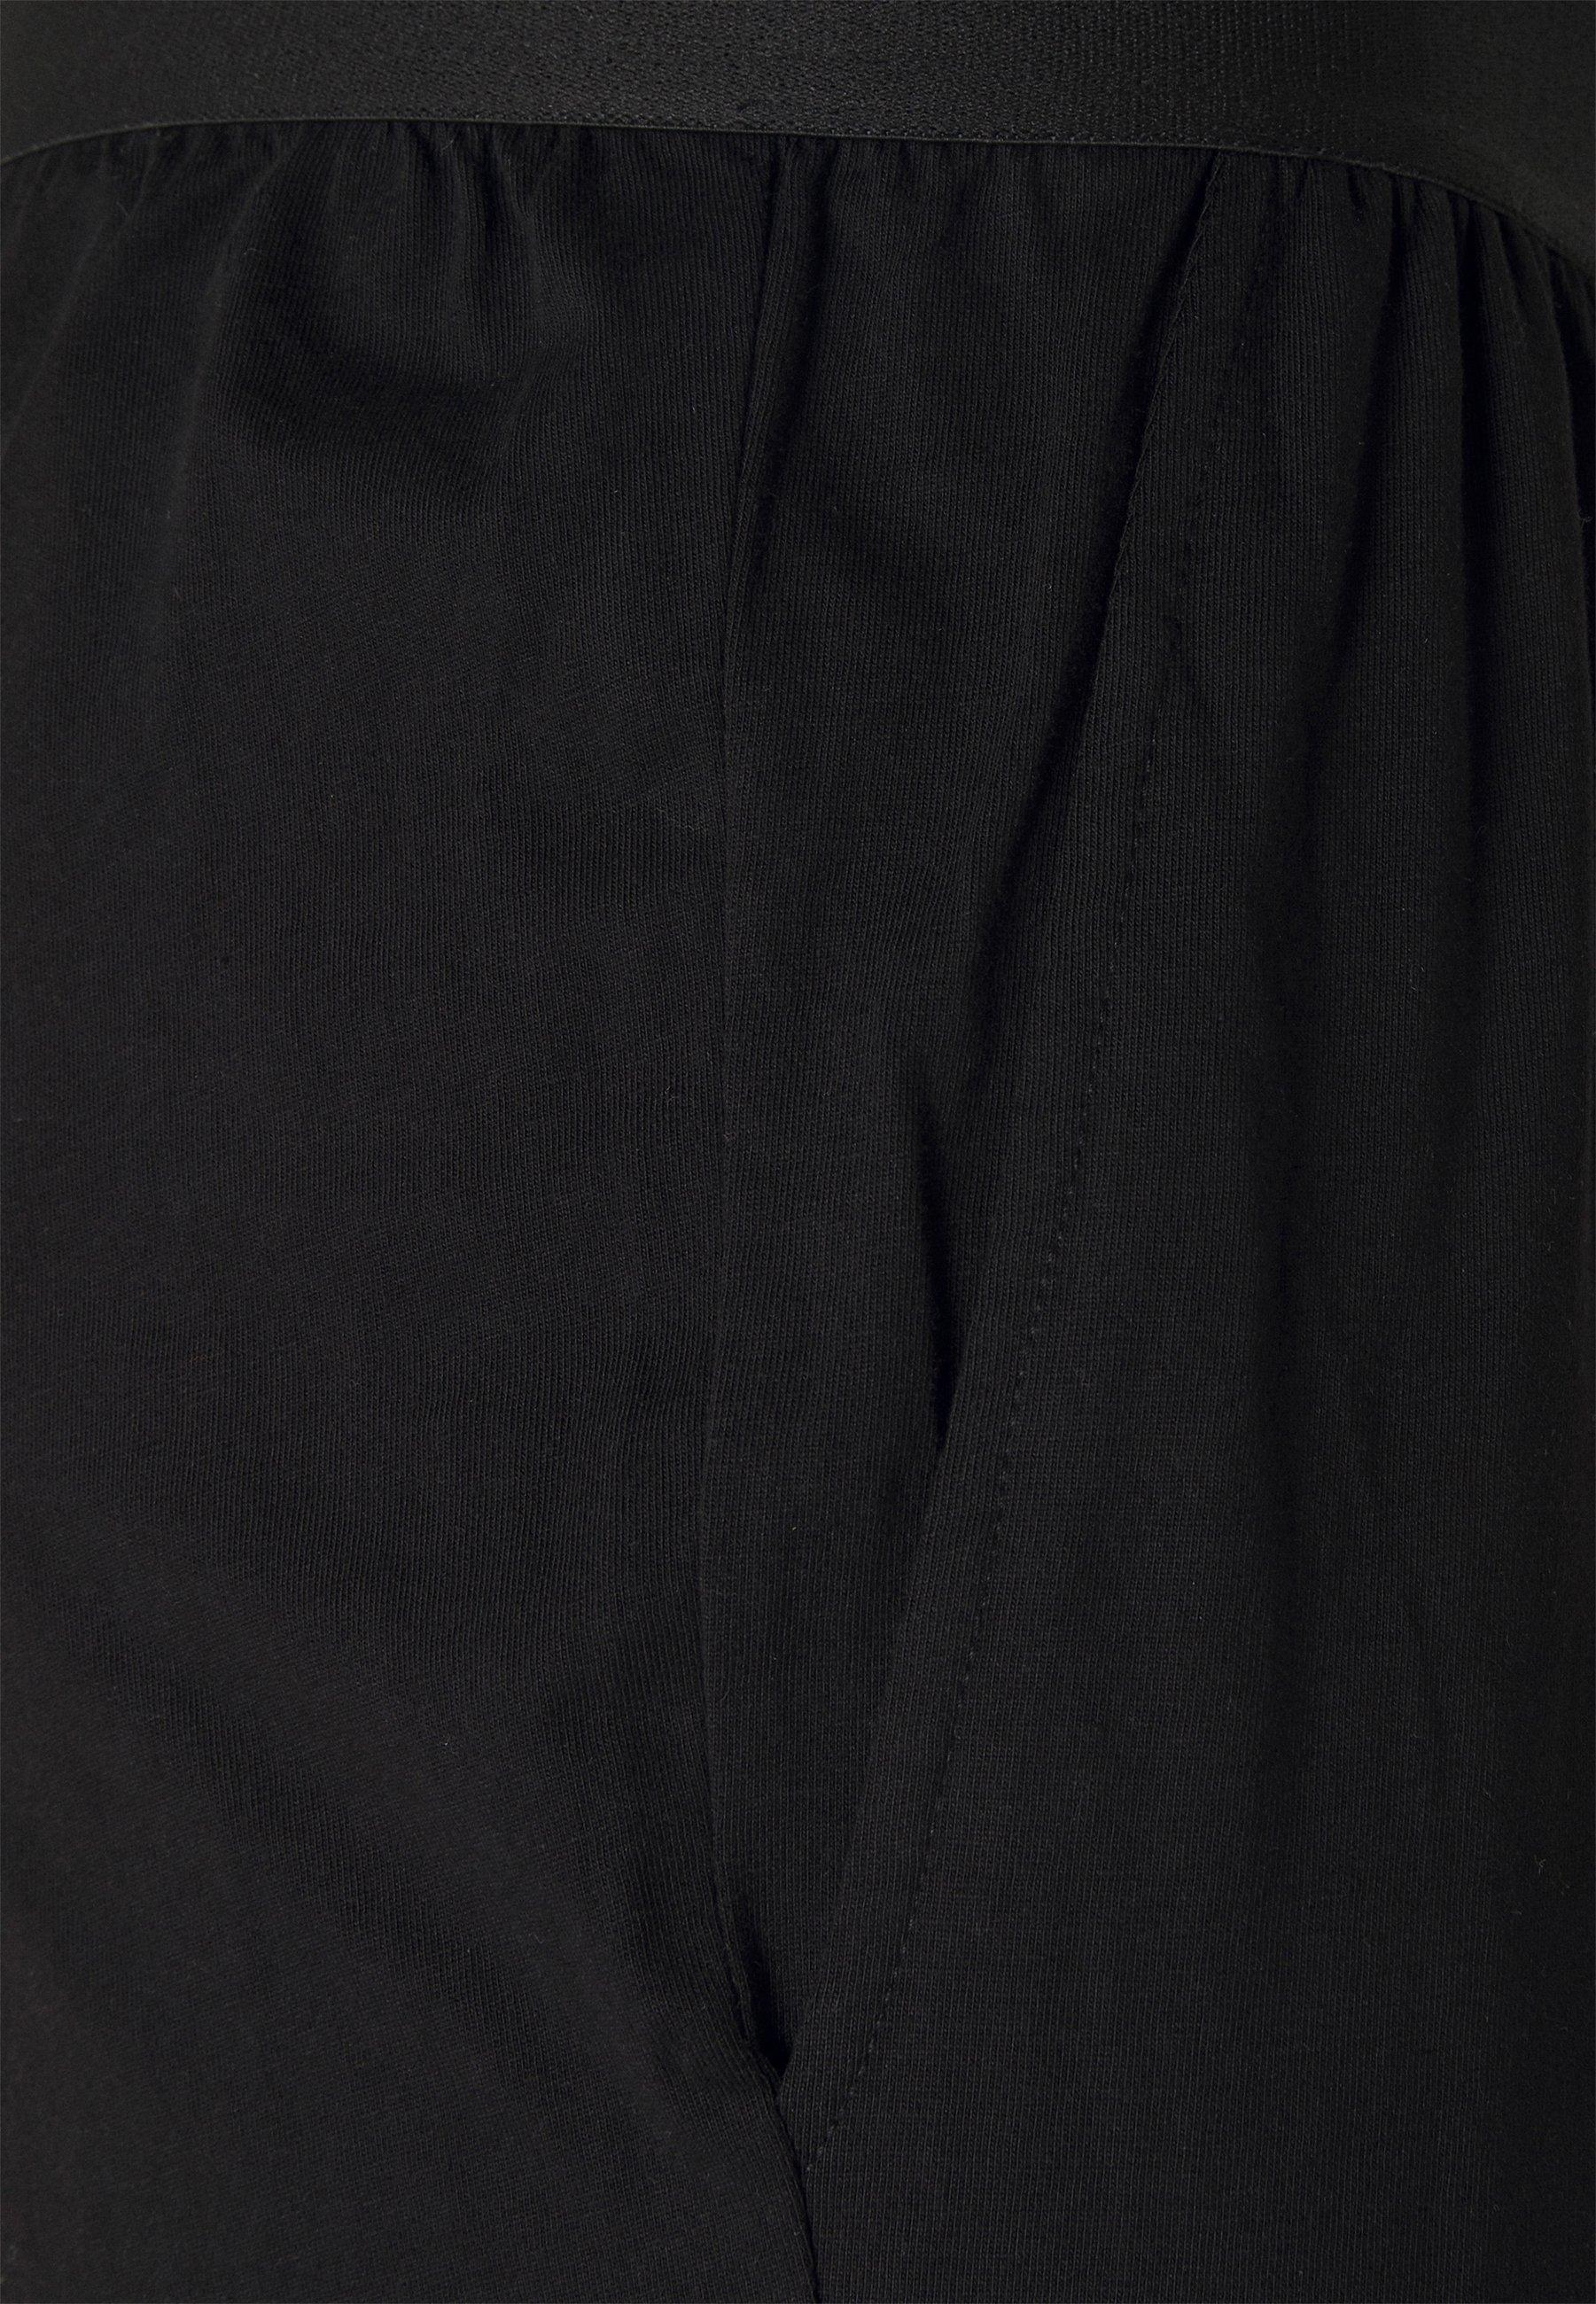 Homme JACJOHN PANTS - Bas de pyjama